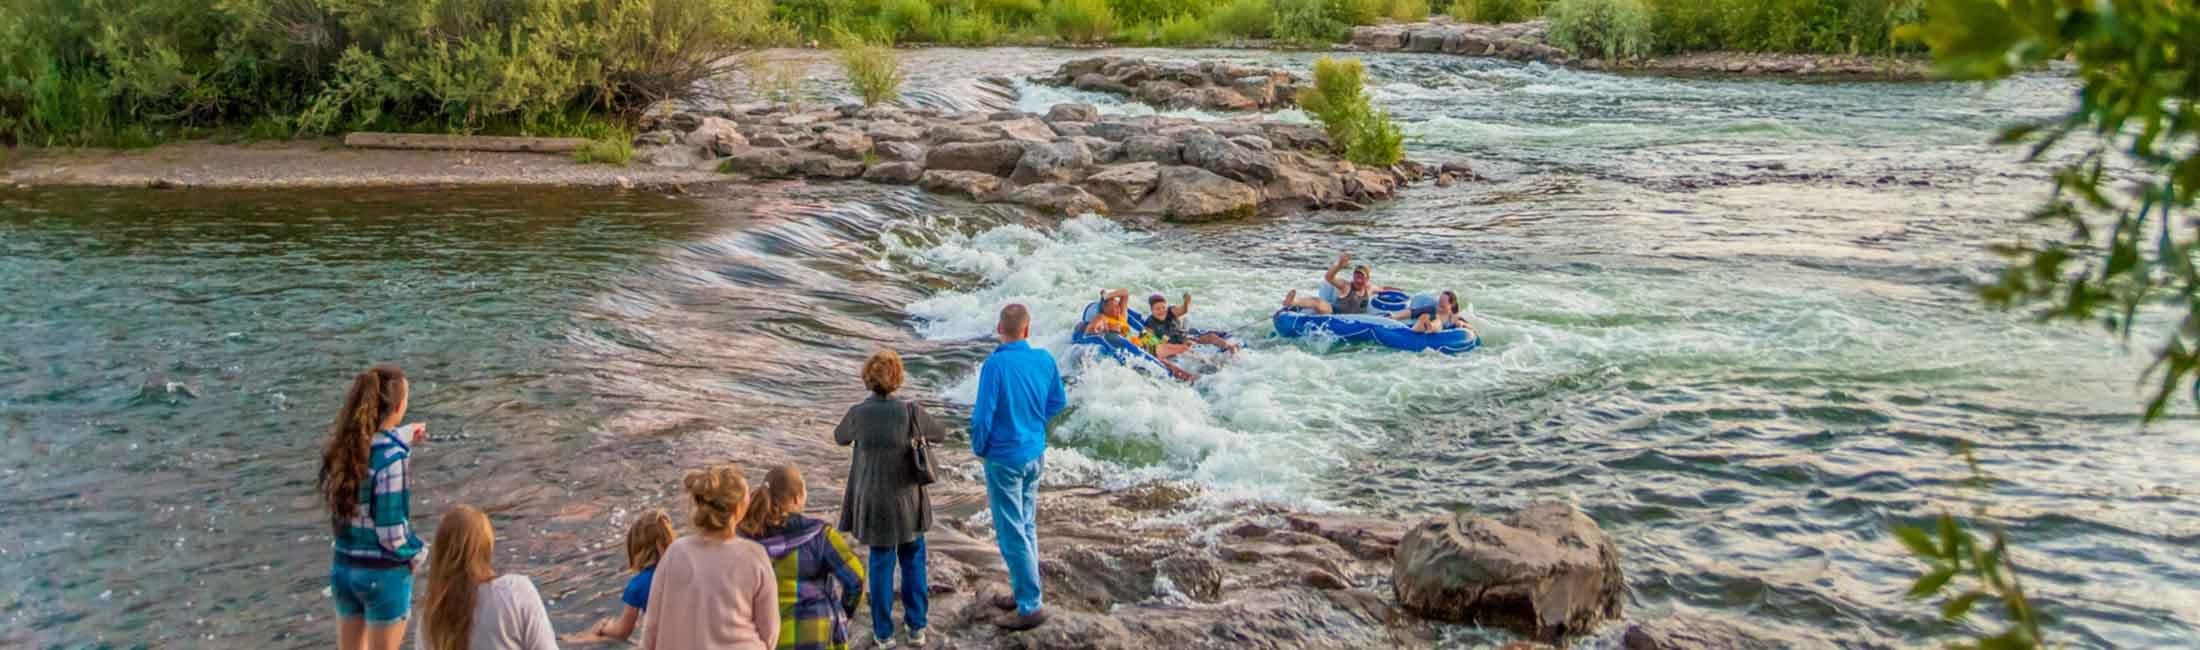 Water Recreation Opportunities in Missoula